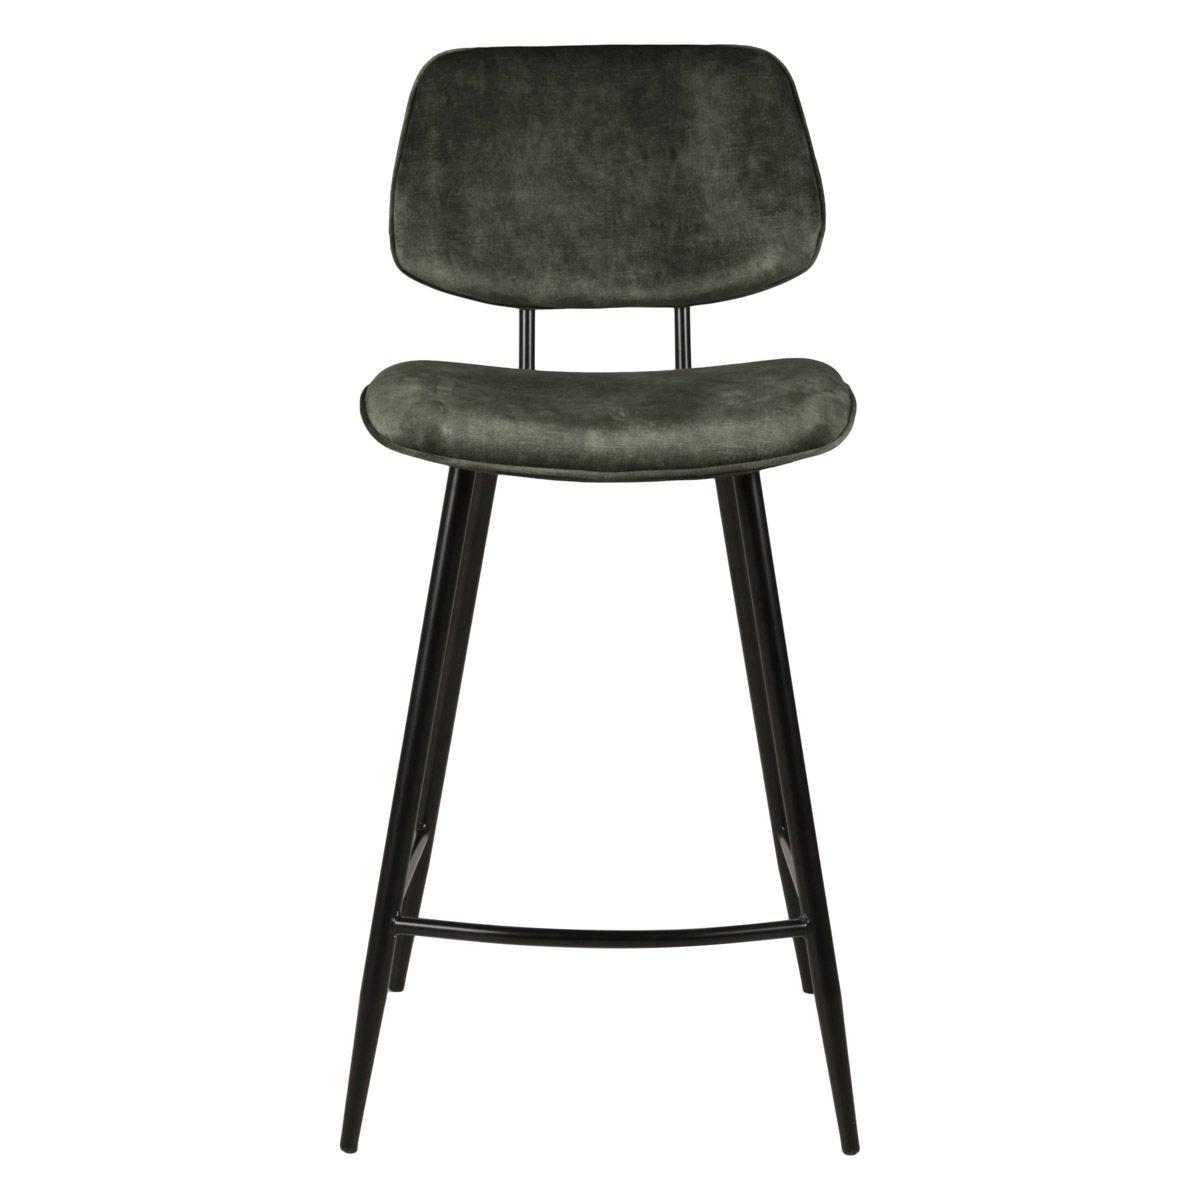 Zago Chaise plan de travail velours vert pieds métal noir h68